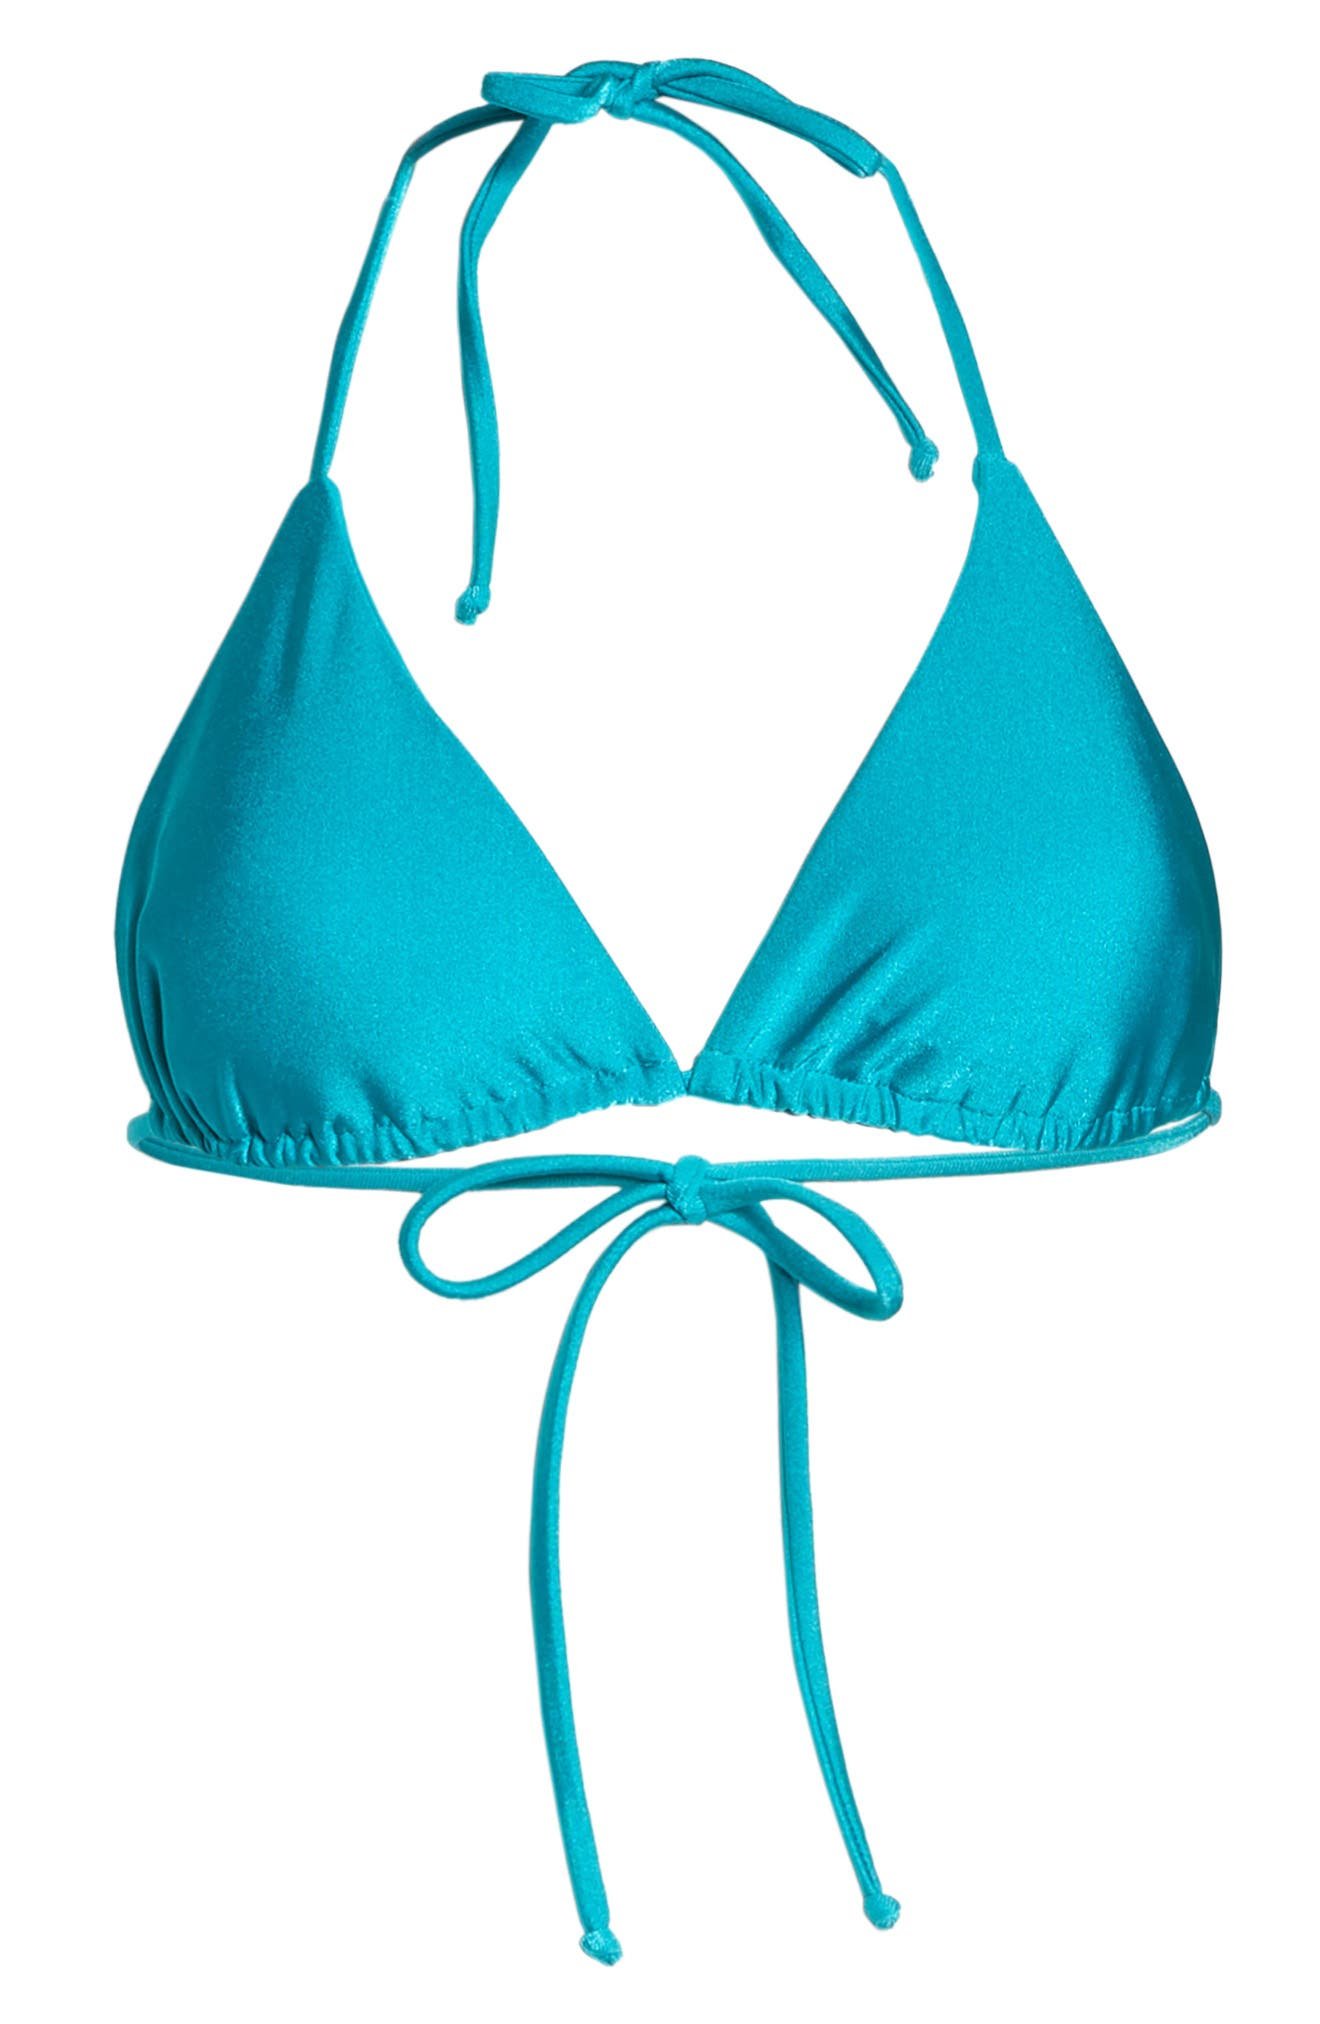 Shimmer Triangle Bikini Top,                             Alternate thumbnail 9, color,                             Arcadia